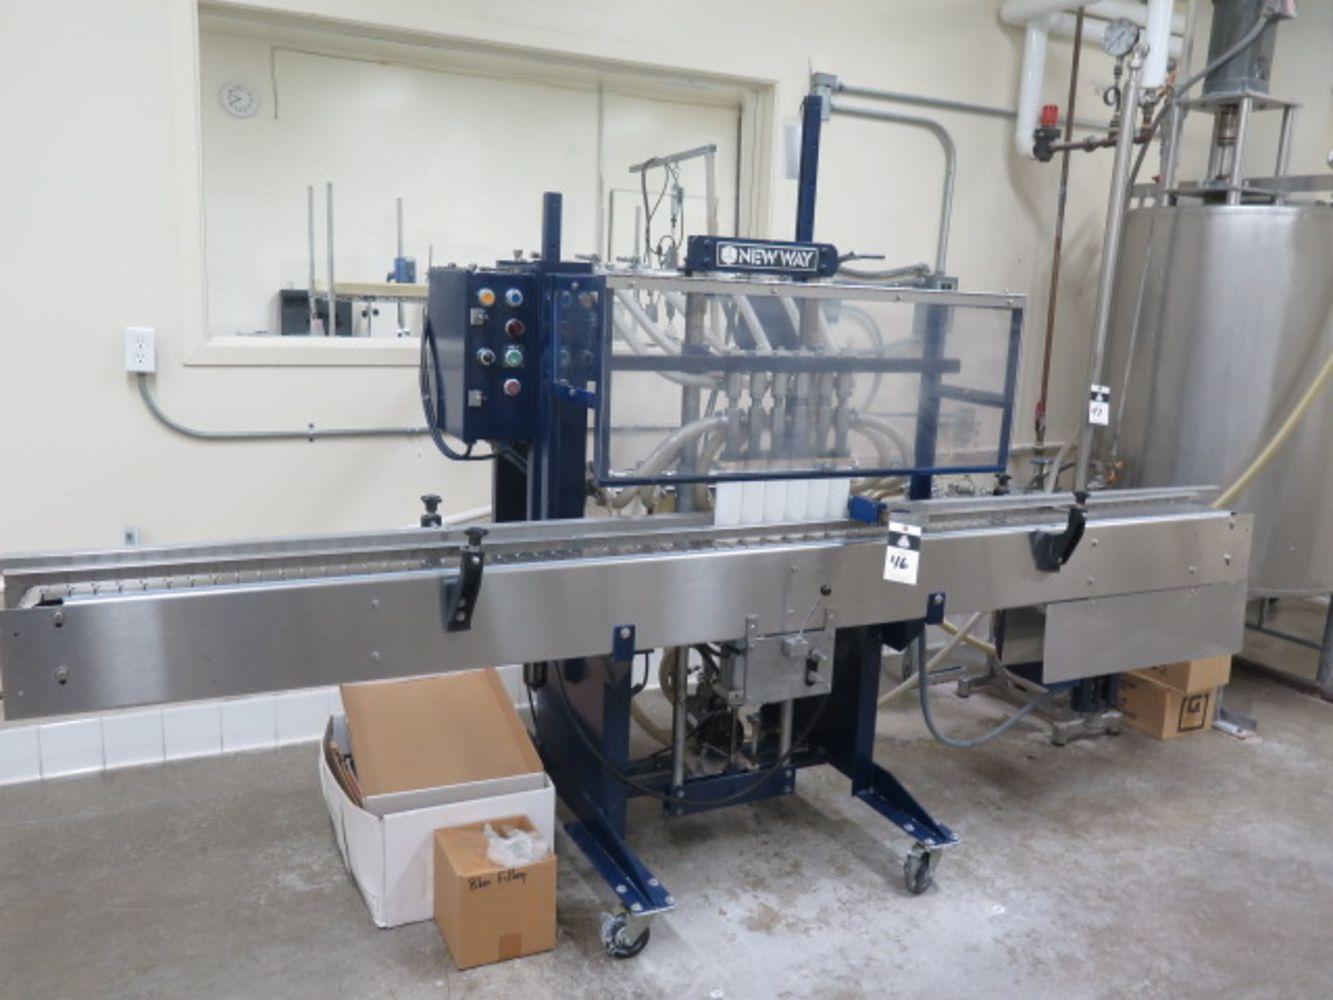 Health & Food Product MFG Facility MFG of Organic Pro Biotics Solutions